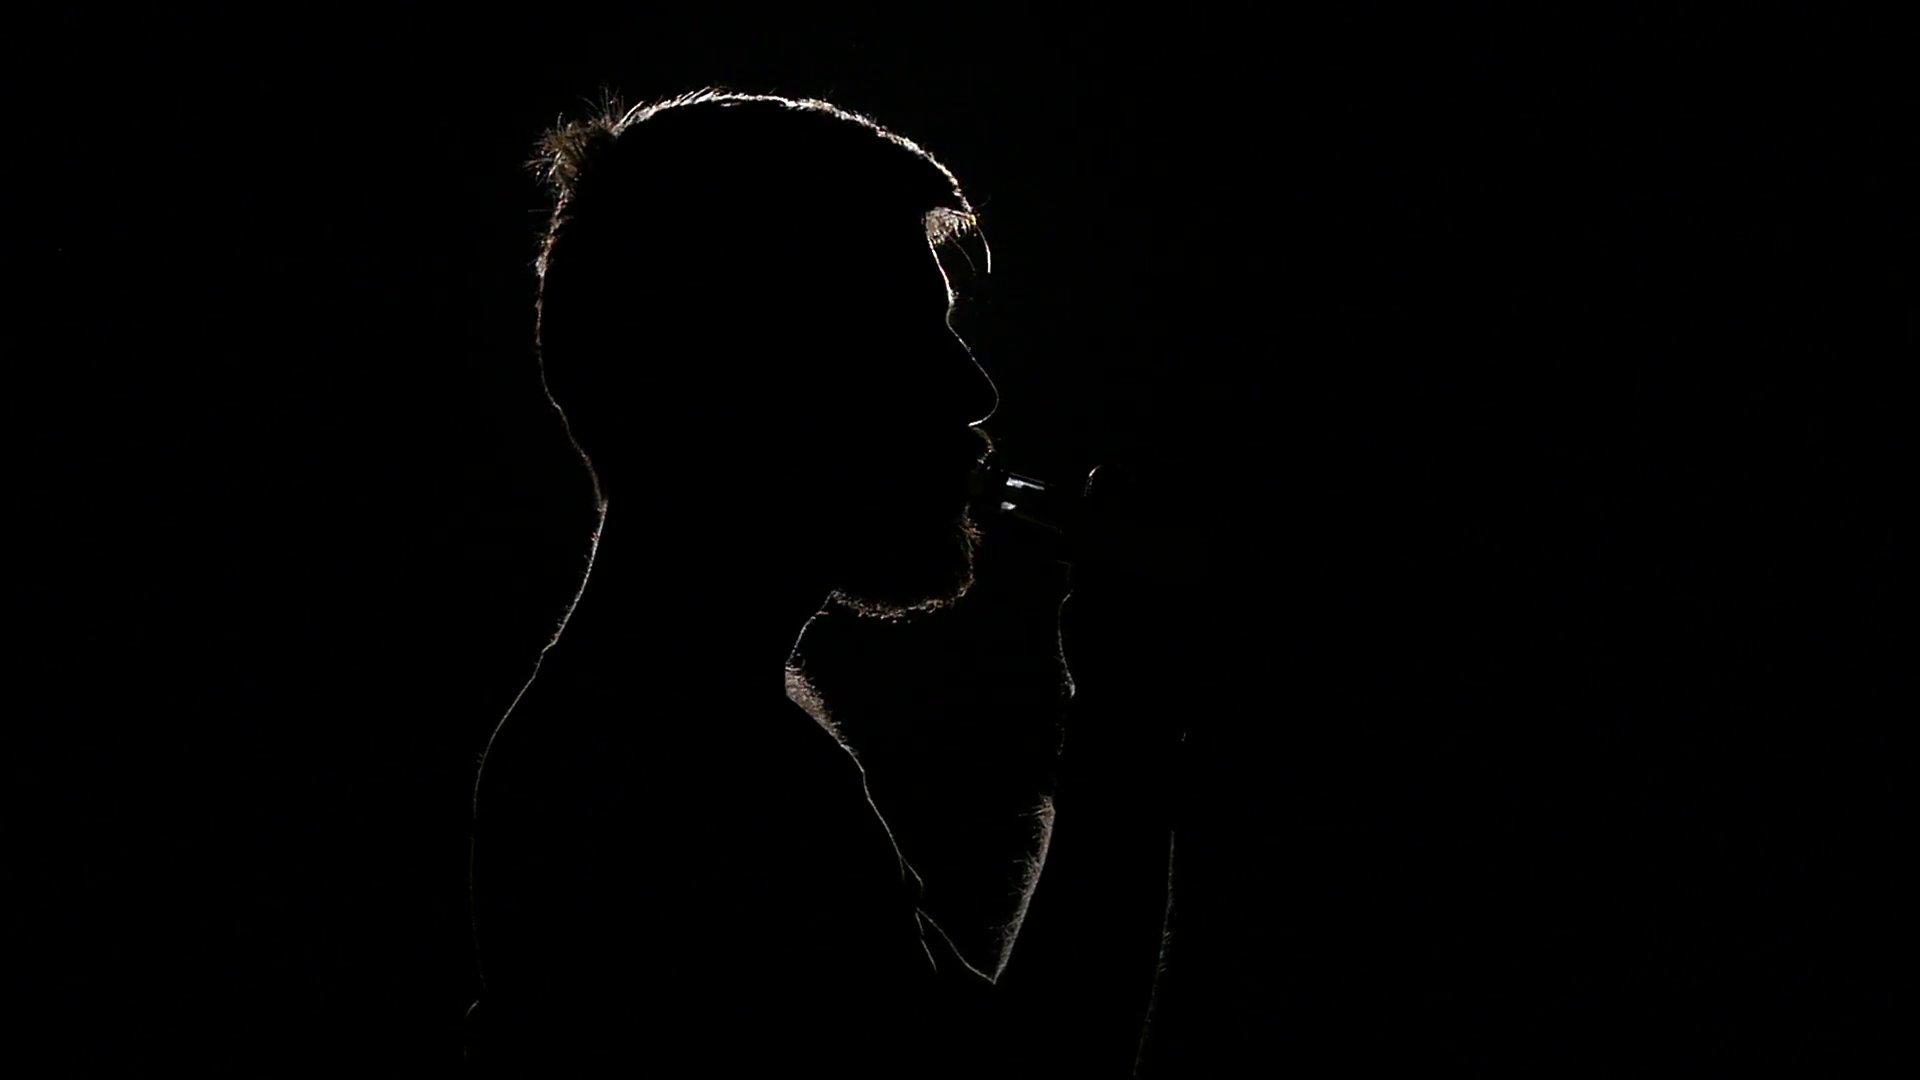 sad man smoking electronic cigarette black silhouette slow motion shmwzxdu  f0000.png?resize=300,169 - 담배를 너무 맛있게 피워 보건복지부에서 연락까지 온 배우